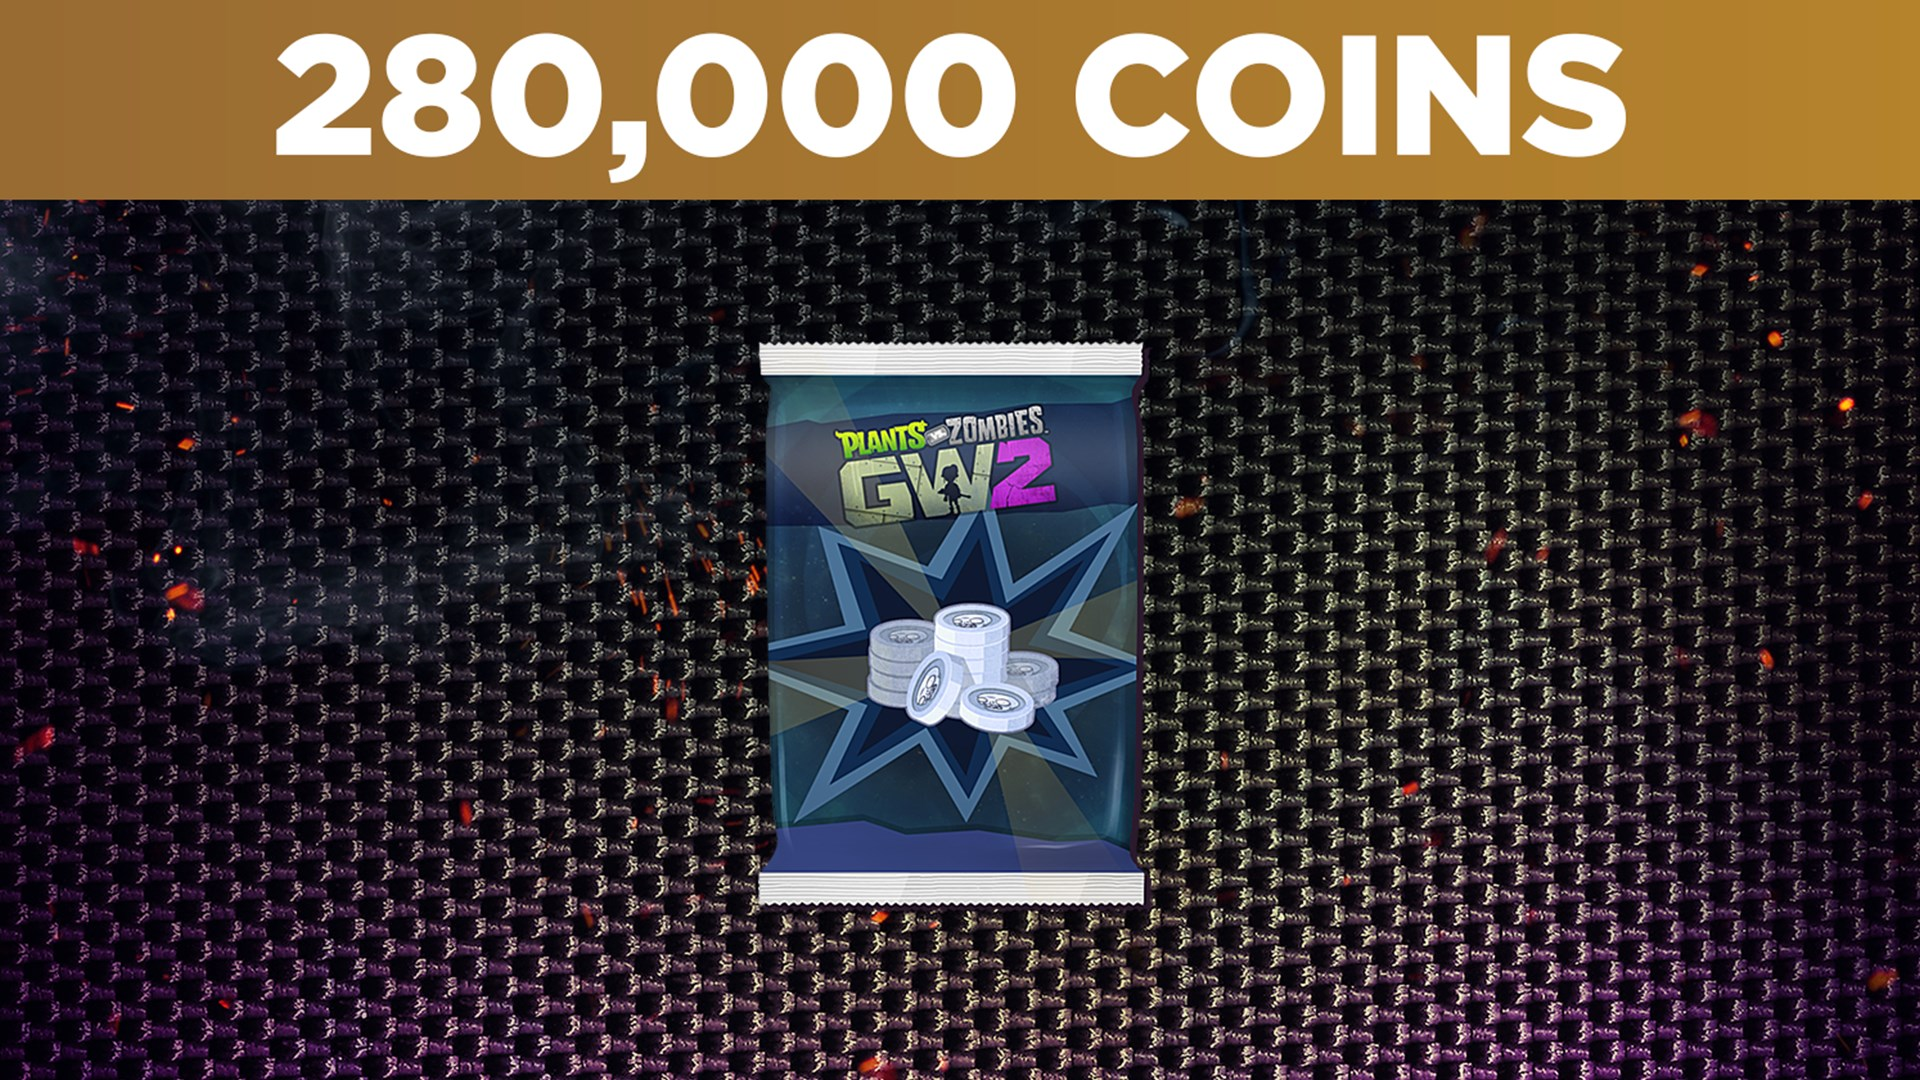 Plants vs. Zombies™ Garden Warfare 2: 280,000 Incredi-coins Pack